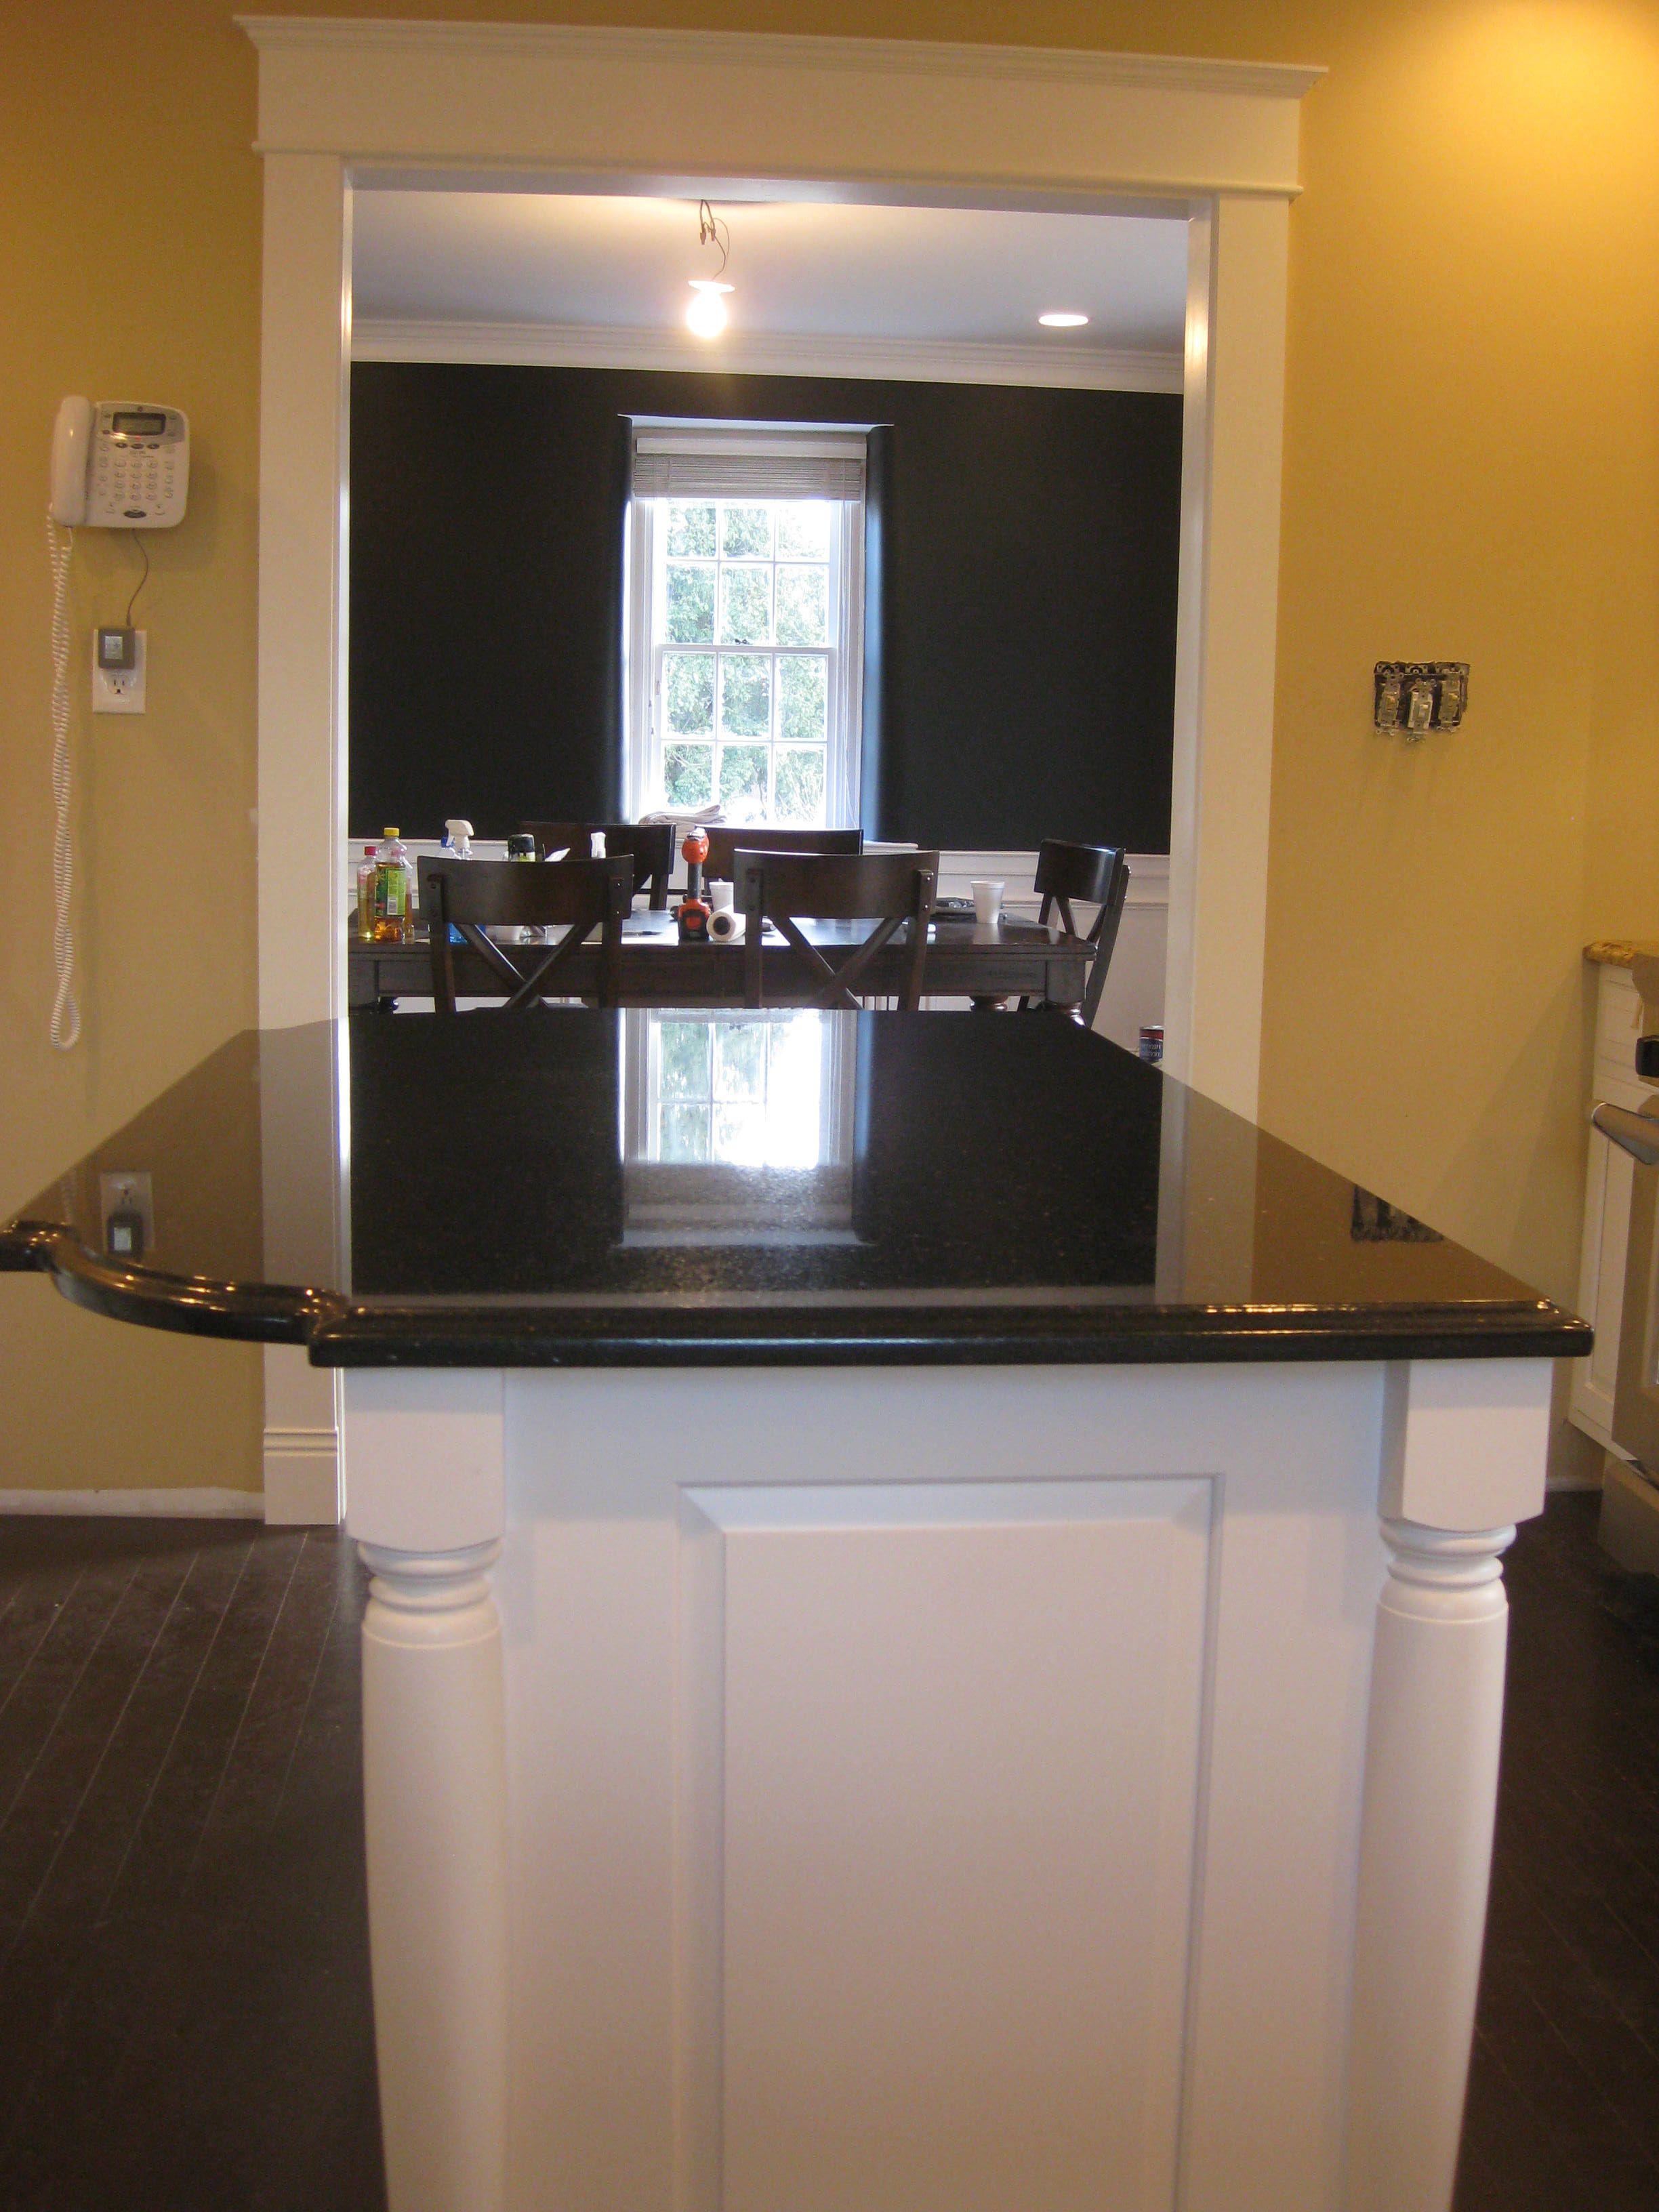 absolute black granite by nsw kitchen inspirations absolute black granite kitchen countertops on kitchen decor black countertop id=79162